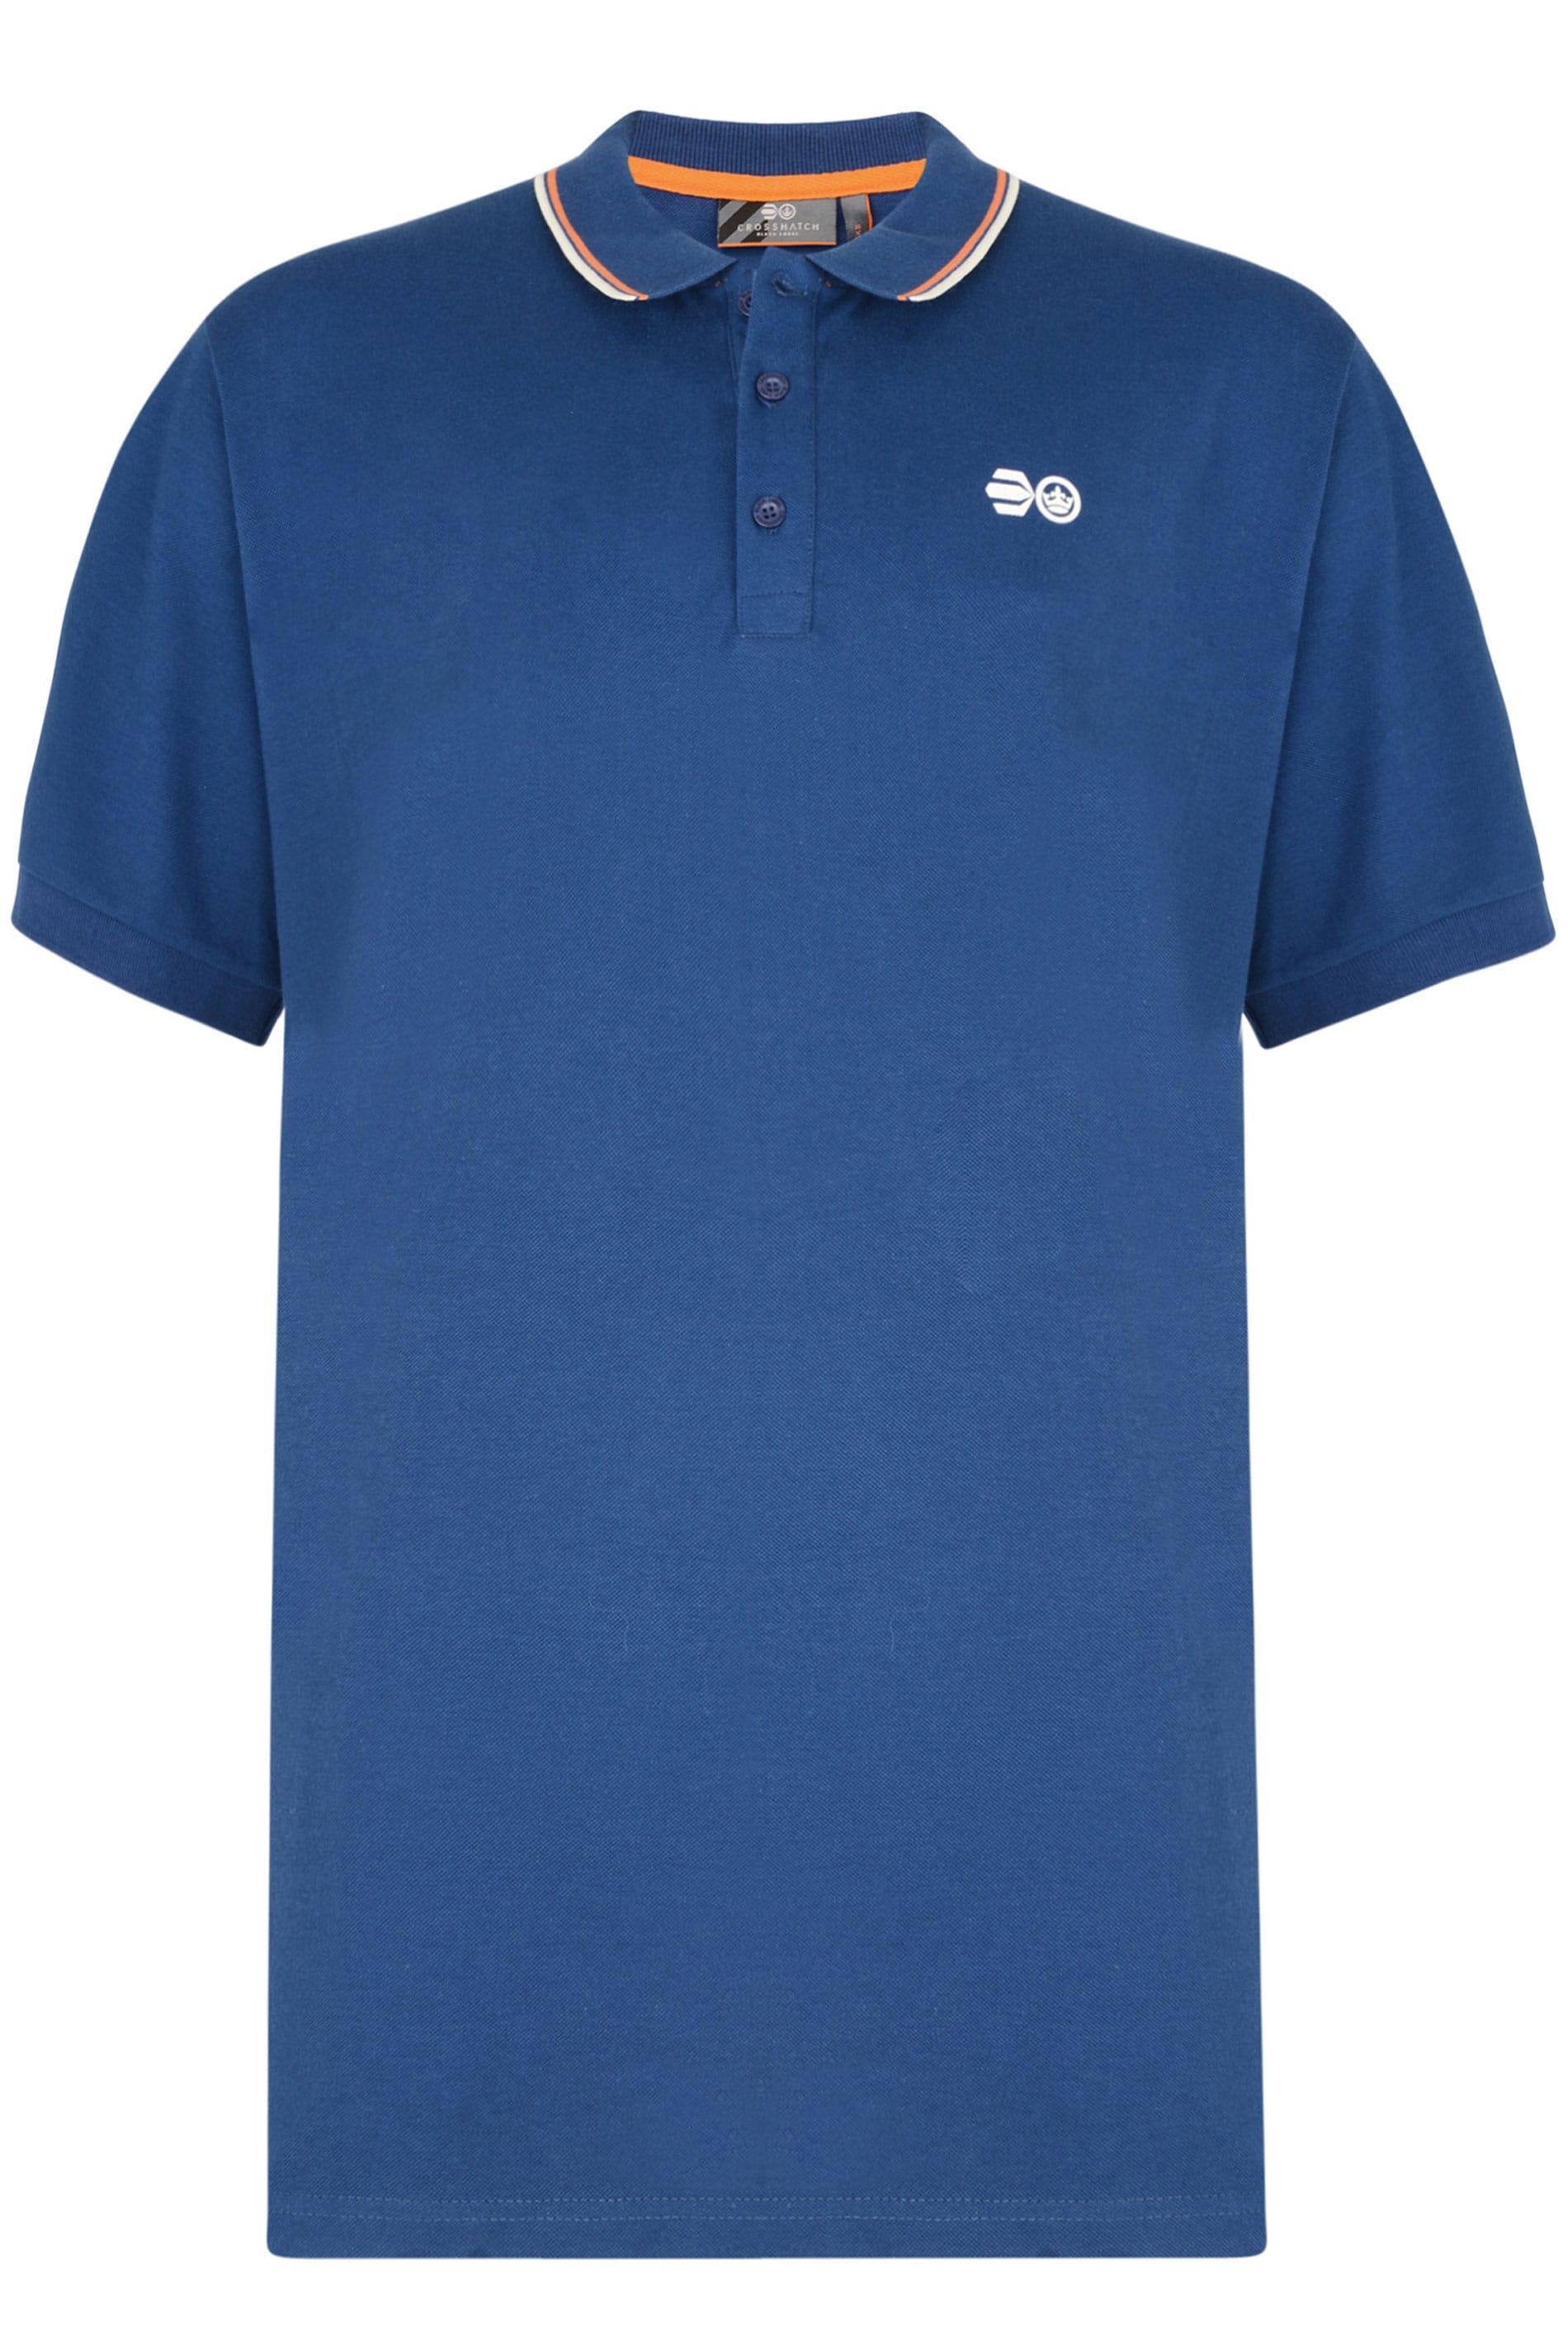 Crosshatch Blue Tipped Polo Shirt